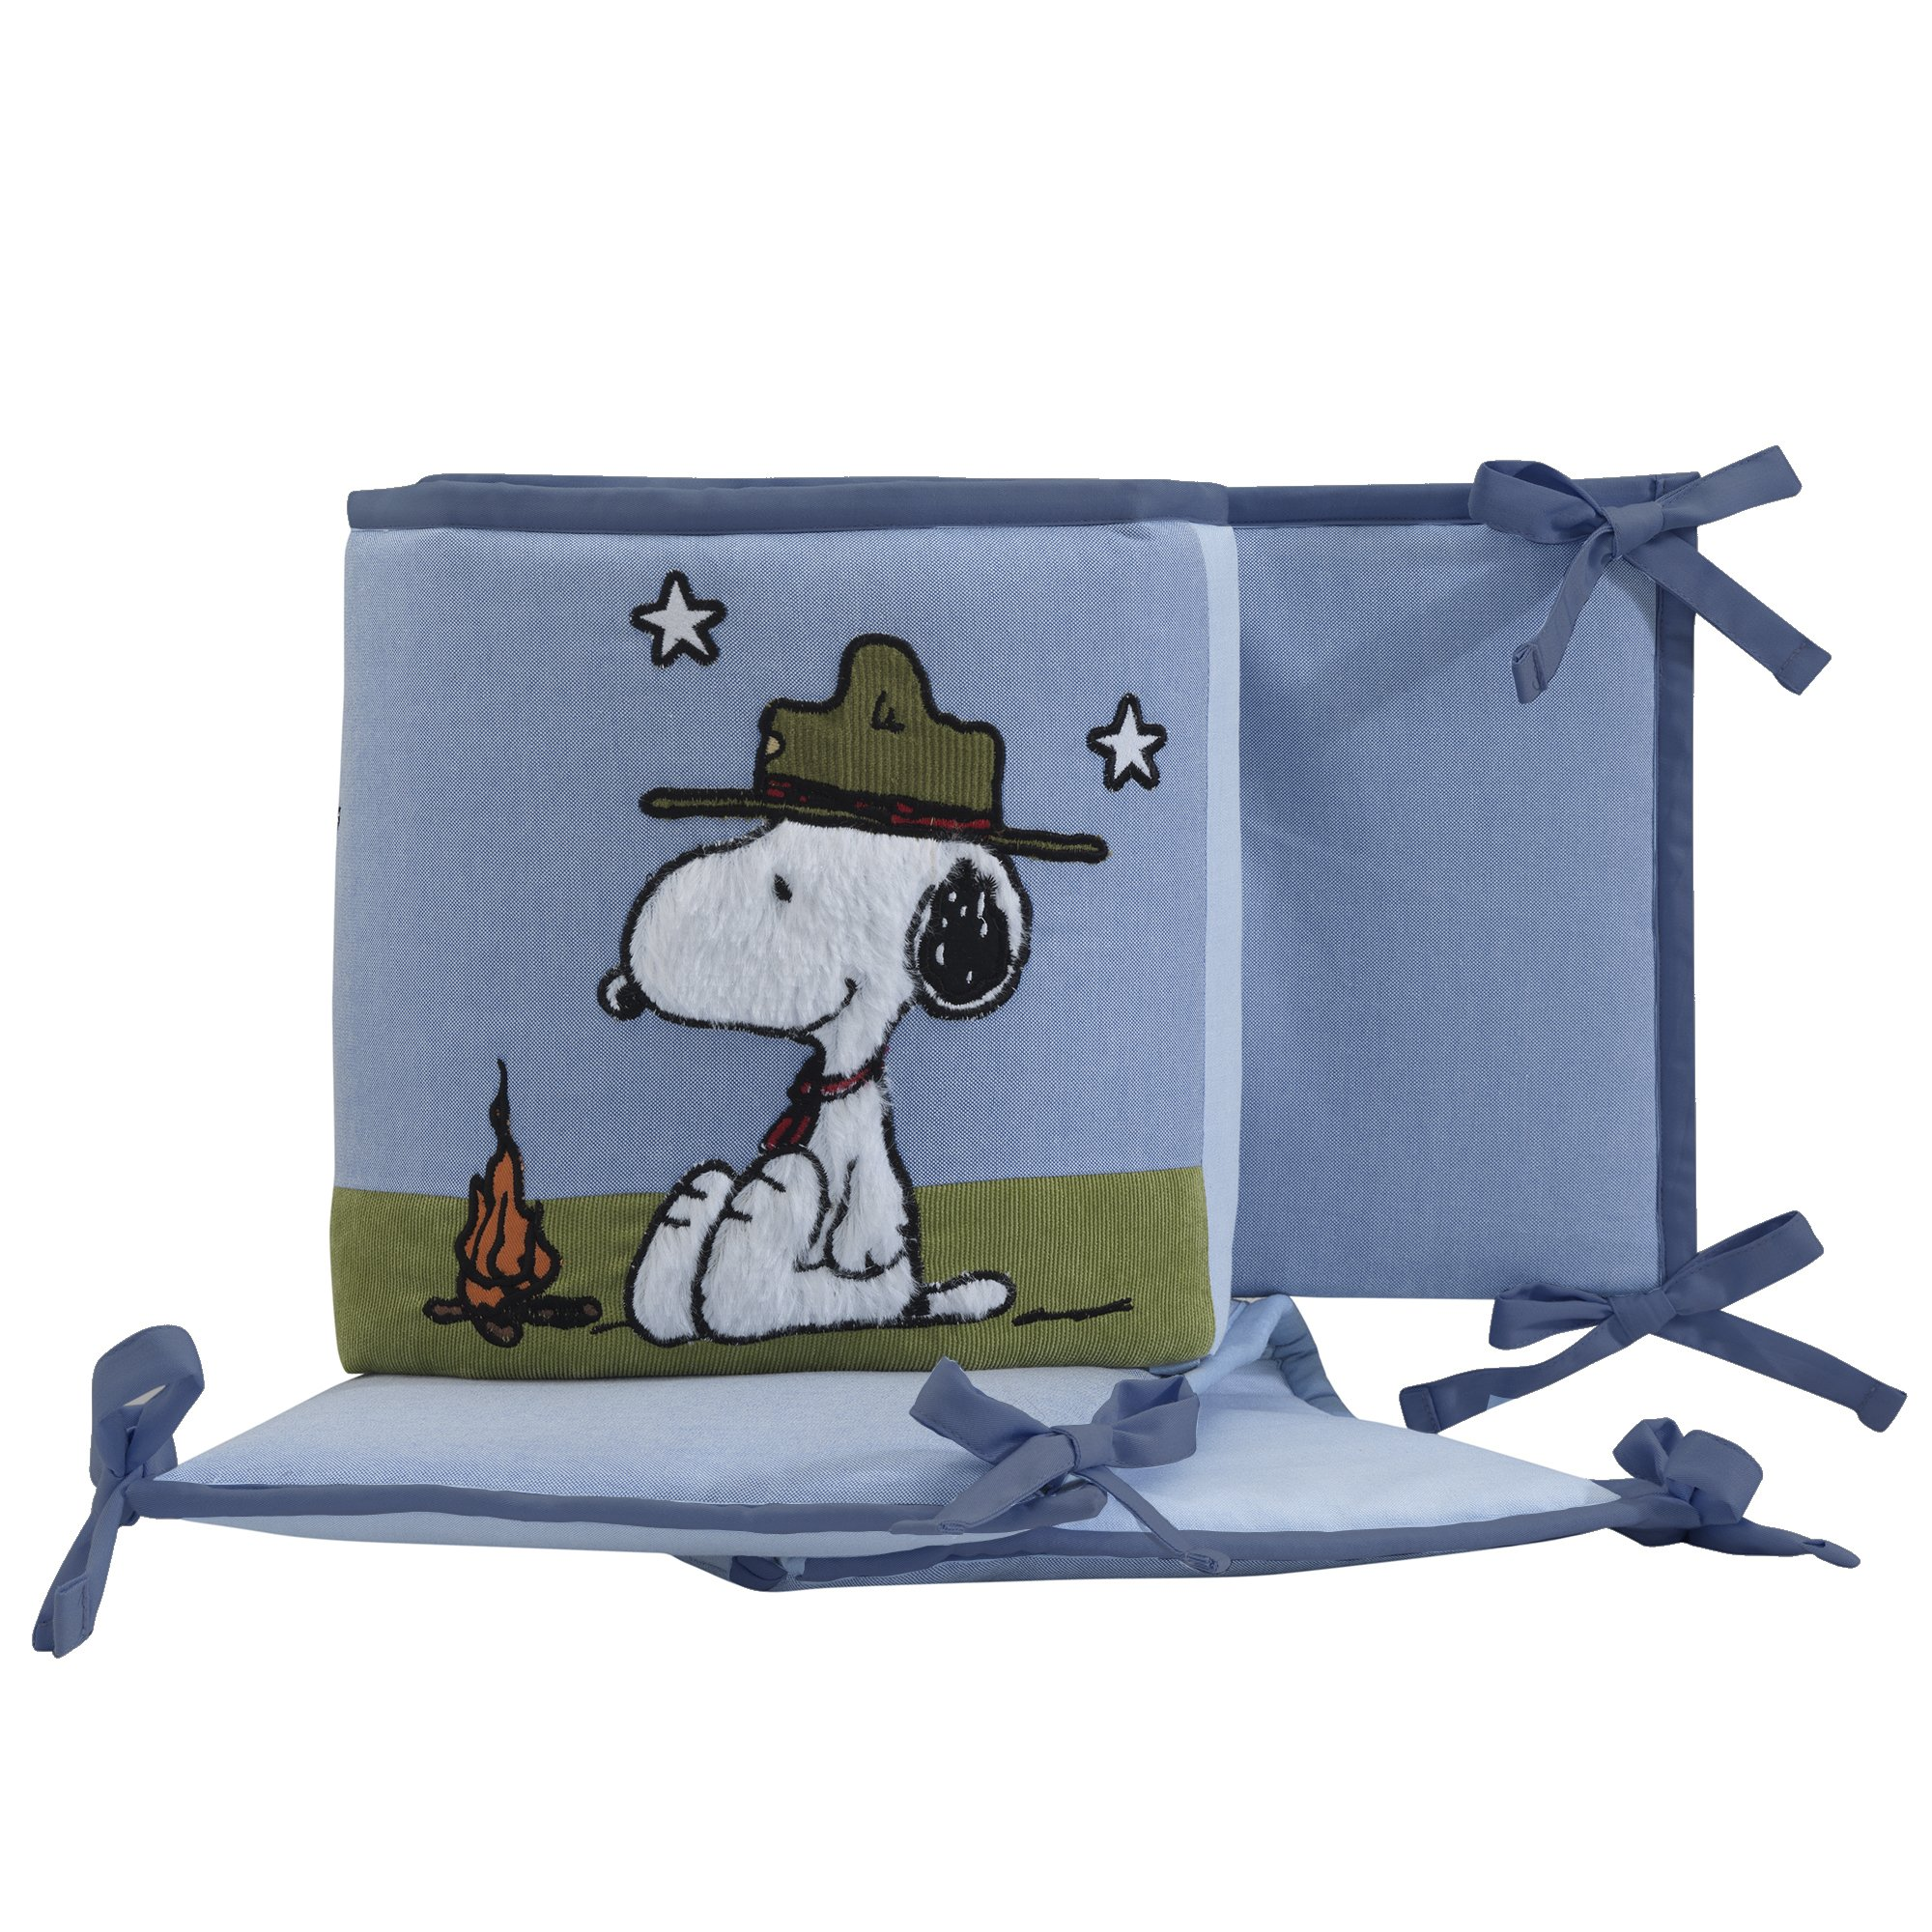 Lambs /& Ivy Ryan Collection Aqua Blue//Gray 4-Piece Reversible Baby Crib Bumper